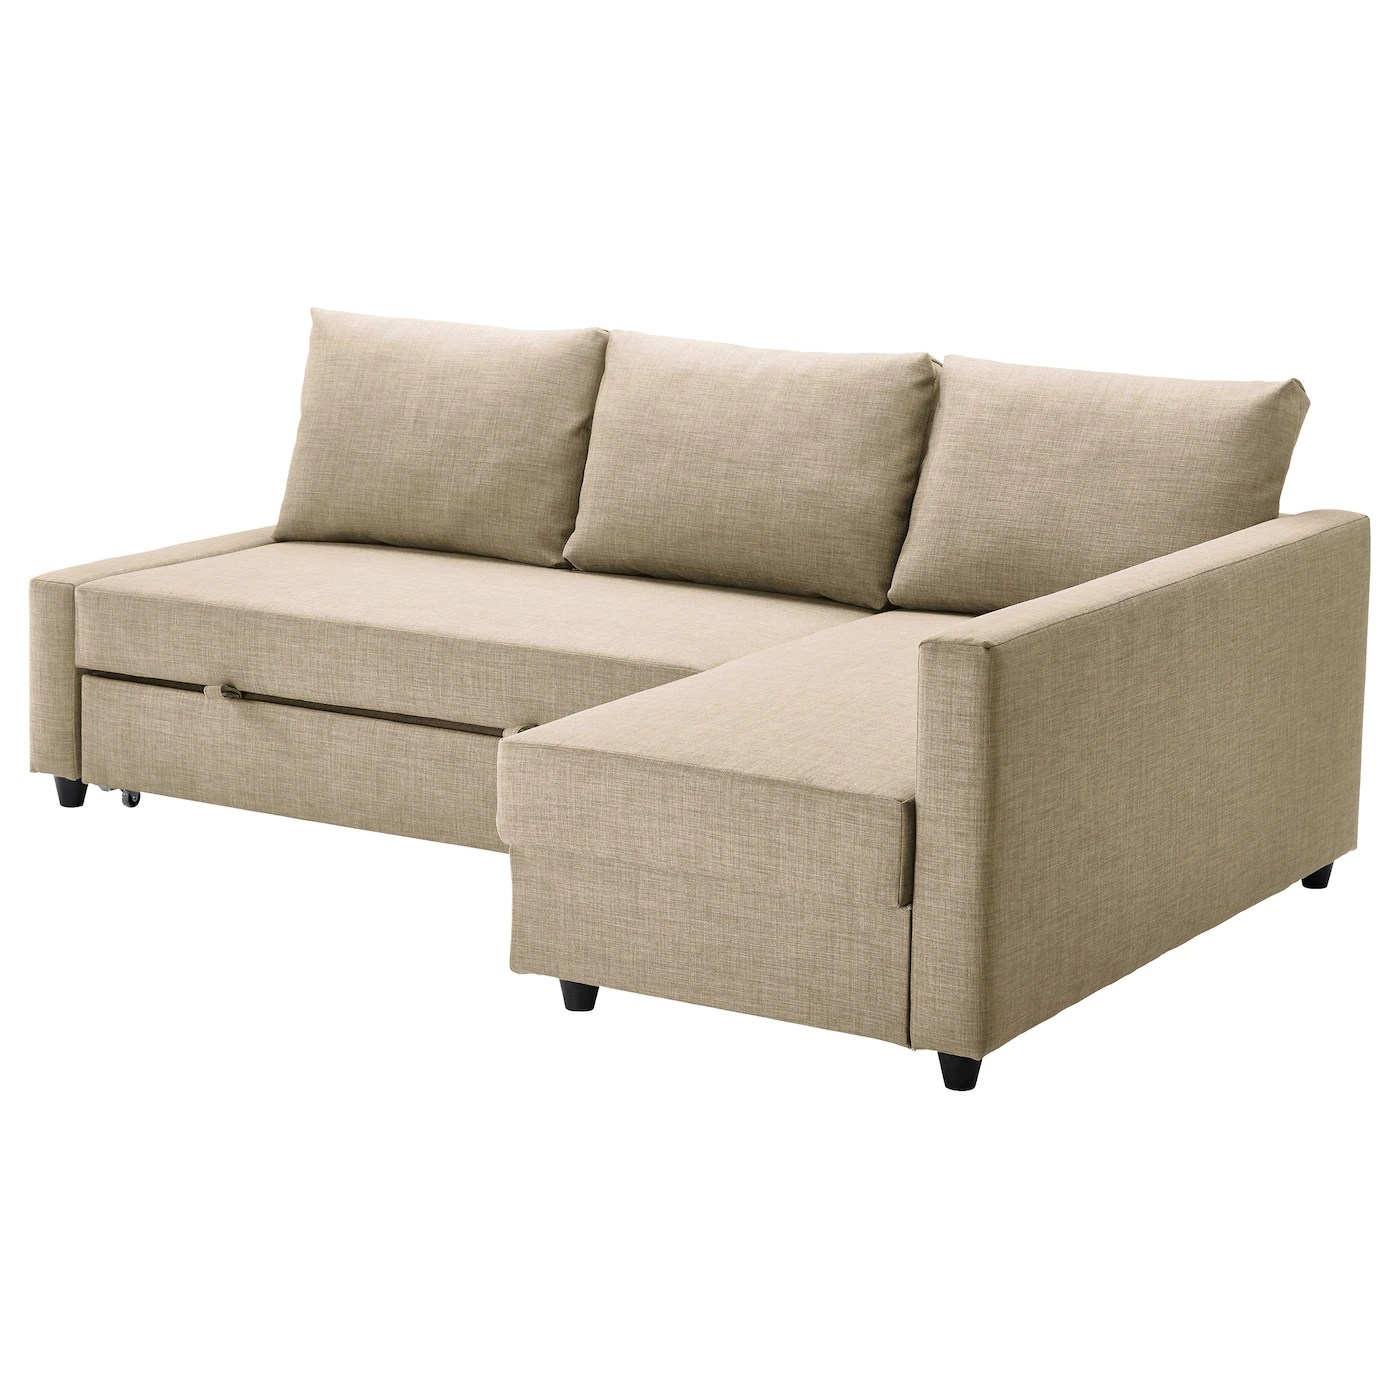 chair sleeper ikea folding teak chairs friheten corner sofa bed with storage skiftebo beige